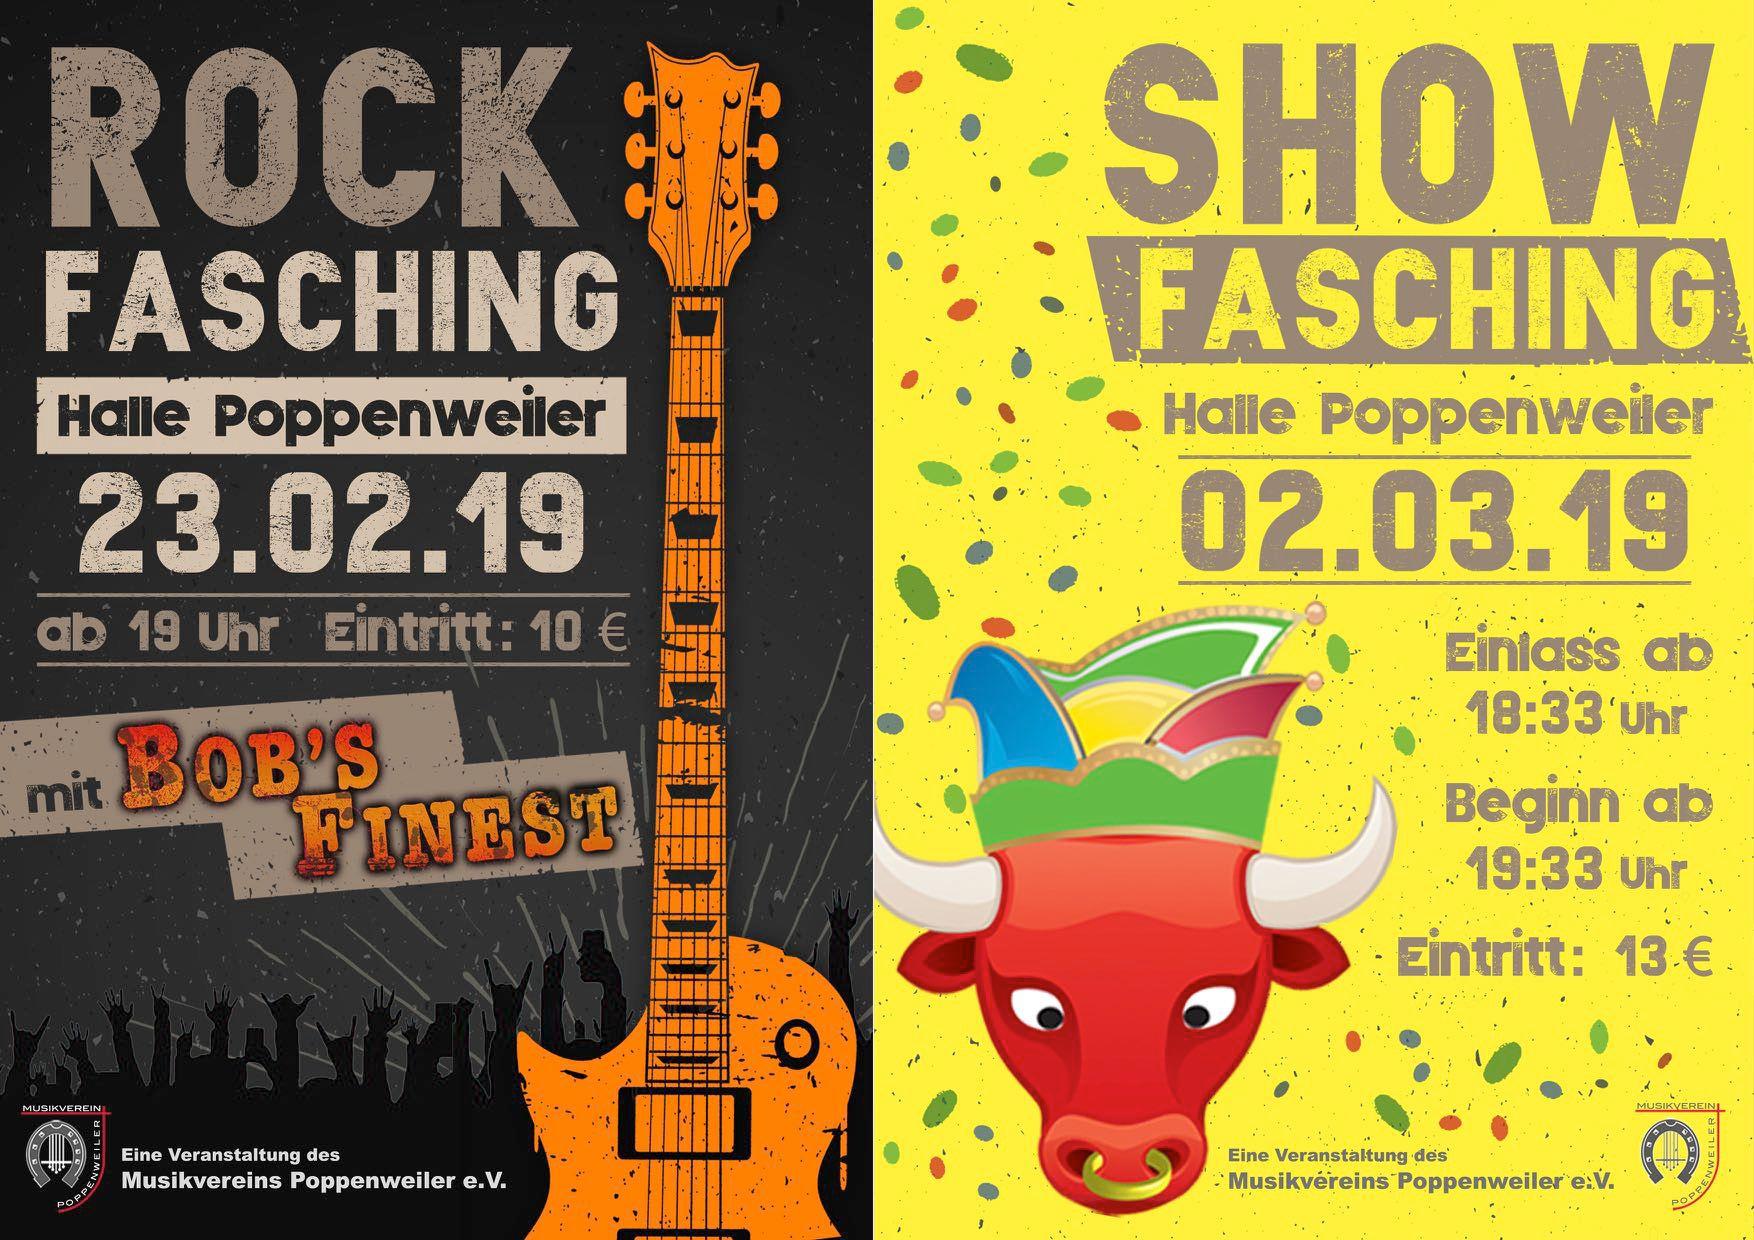 Rockfasching 23 02 2019 Show Fasching 02 03 2019 Musikverein